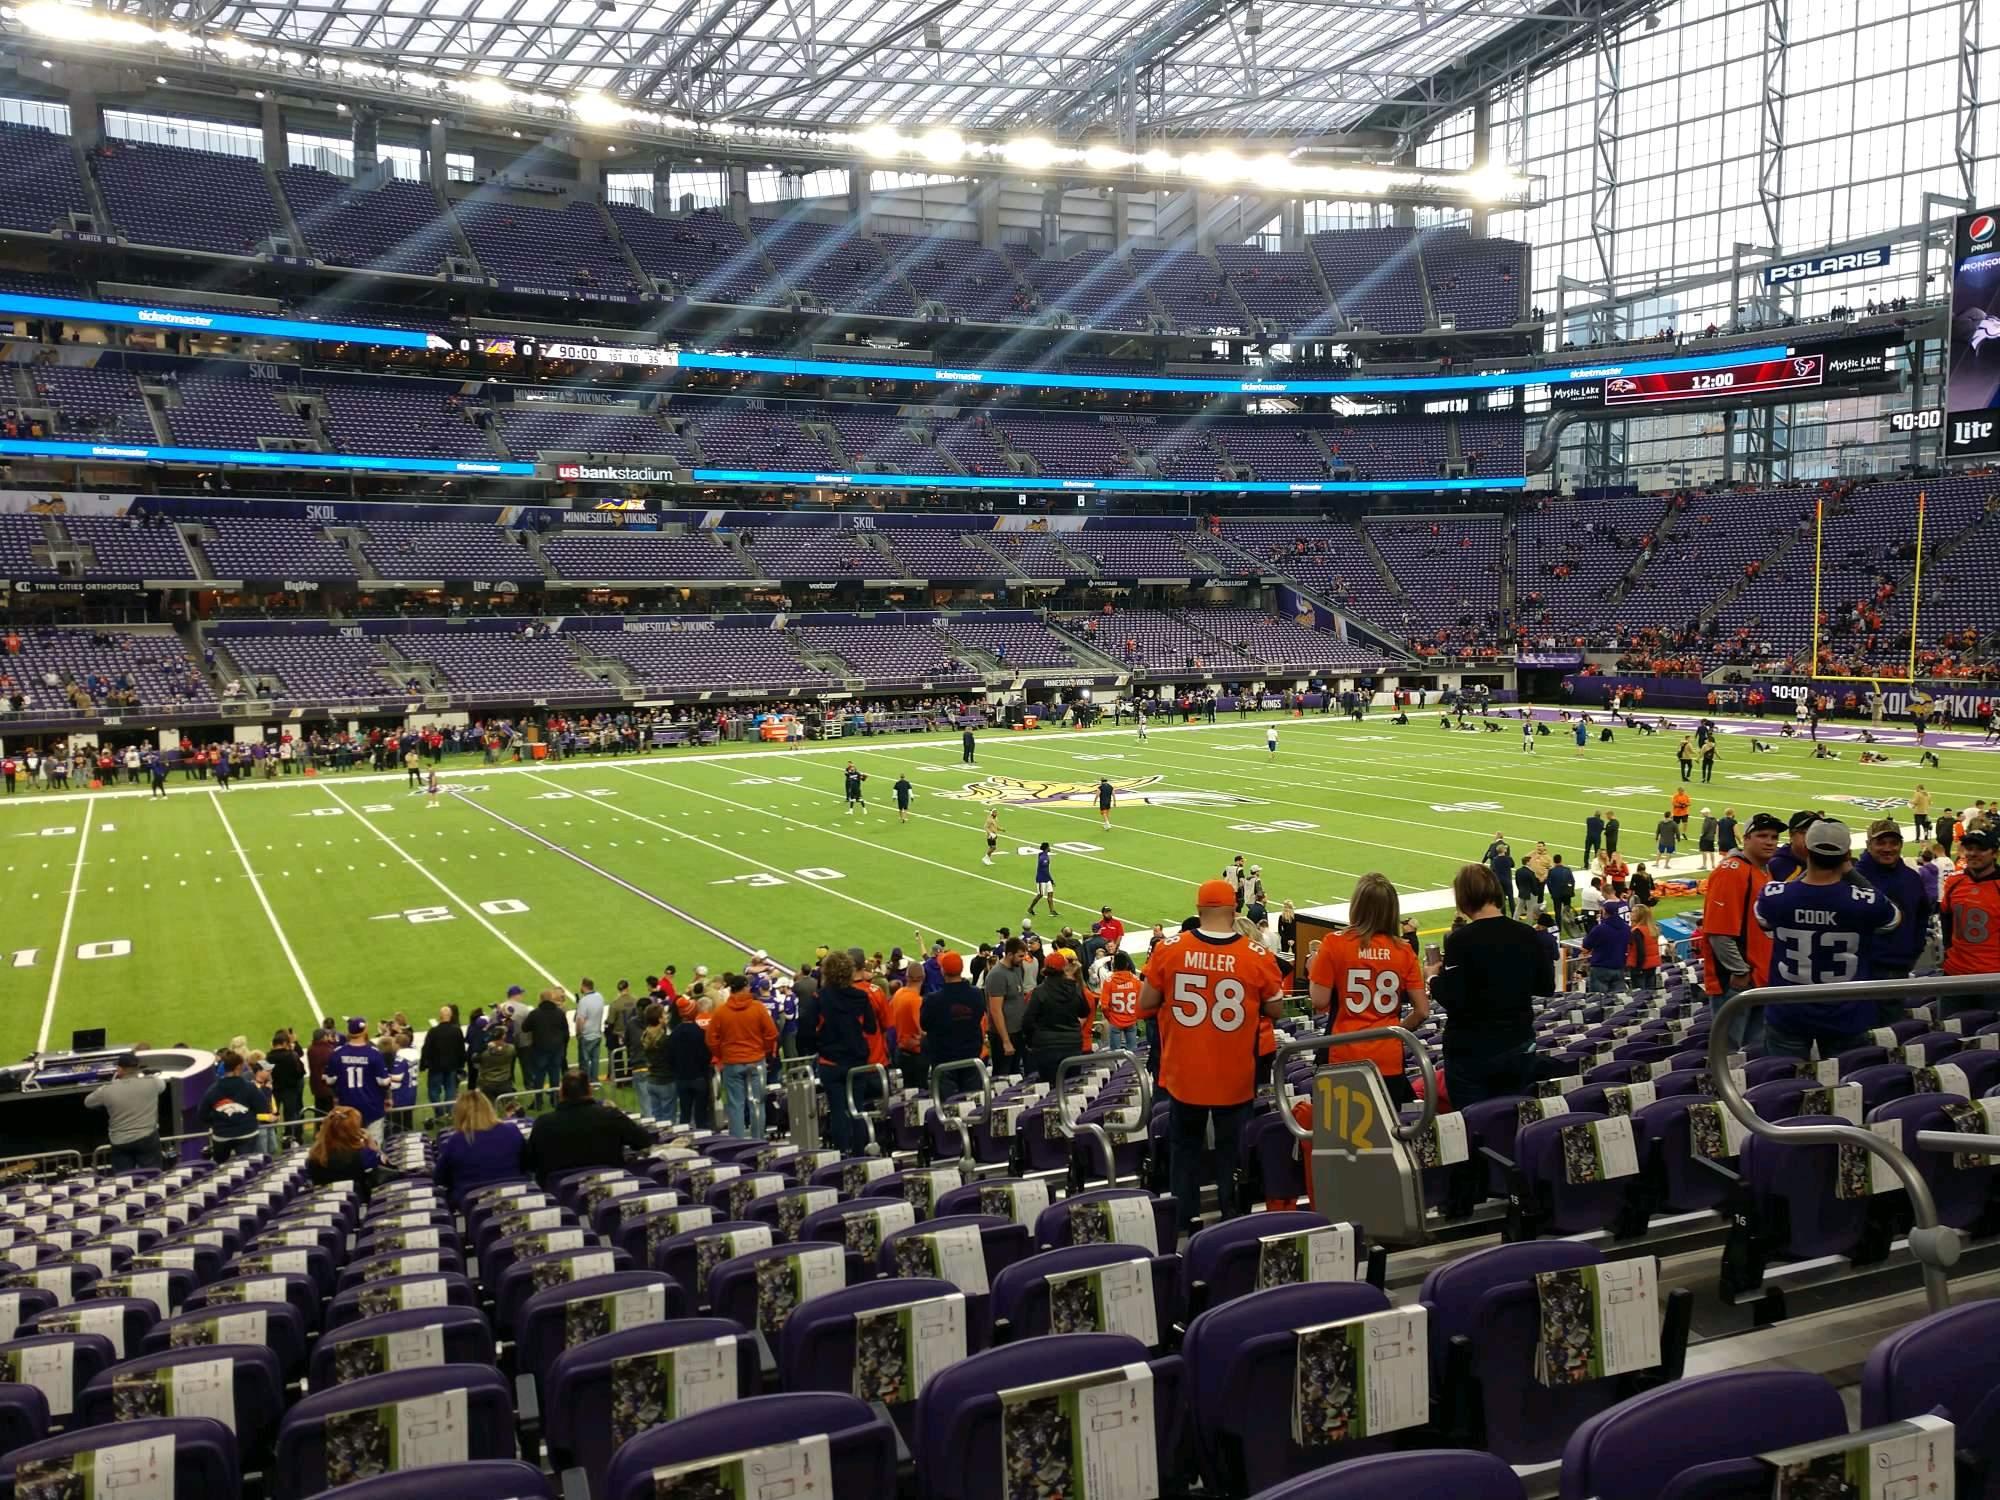 U.S. Bank Stadium Section 112 Row 20 Seat 5